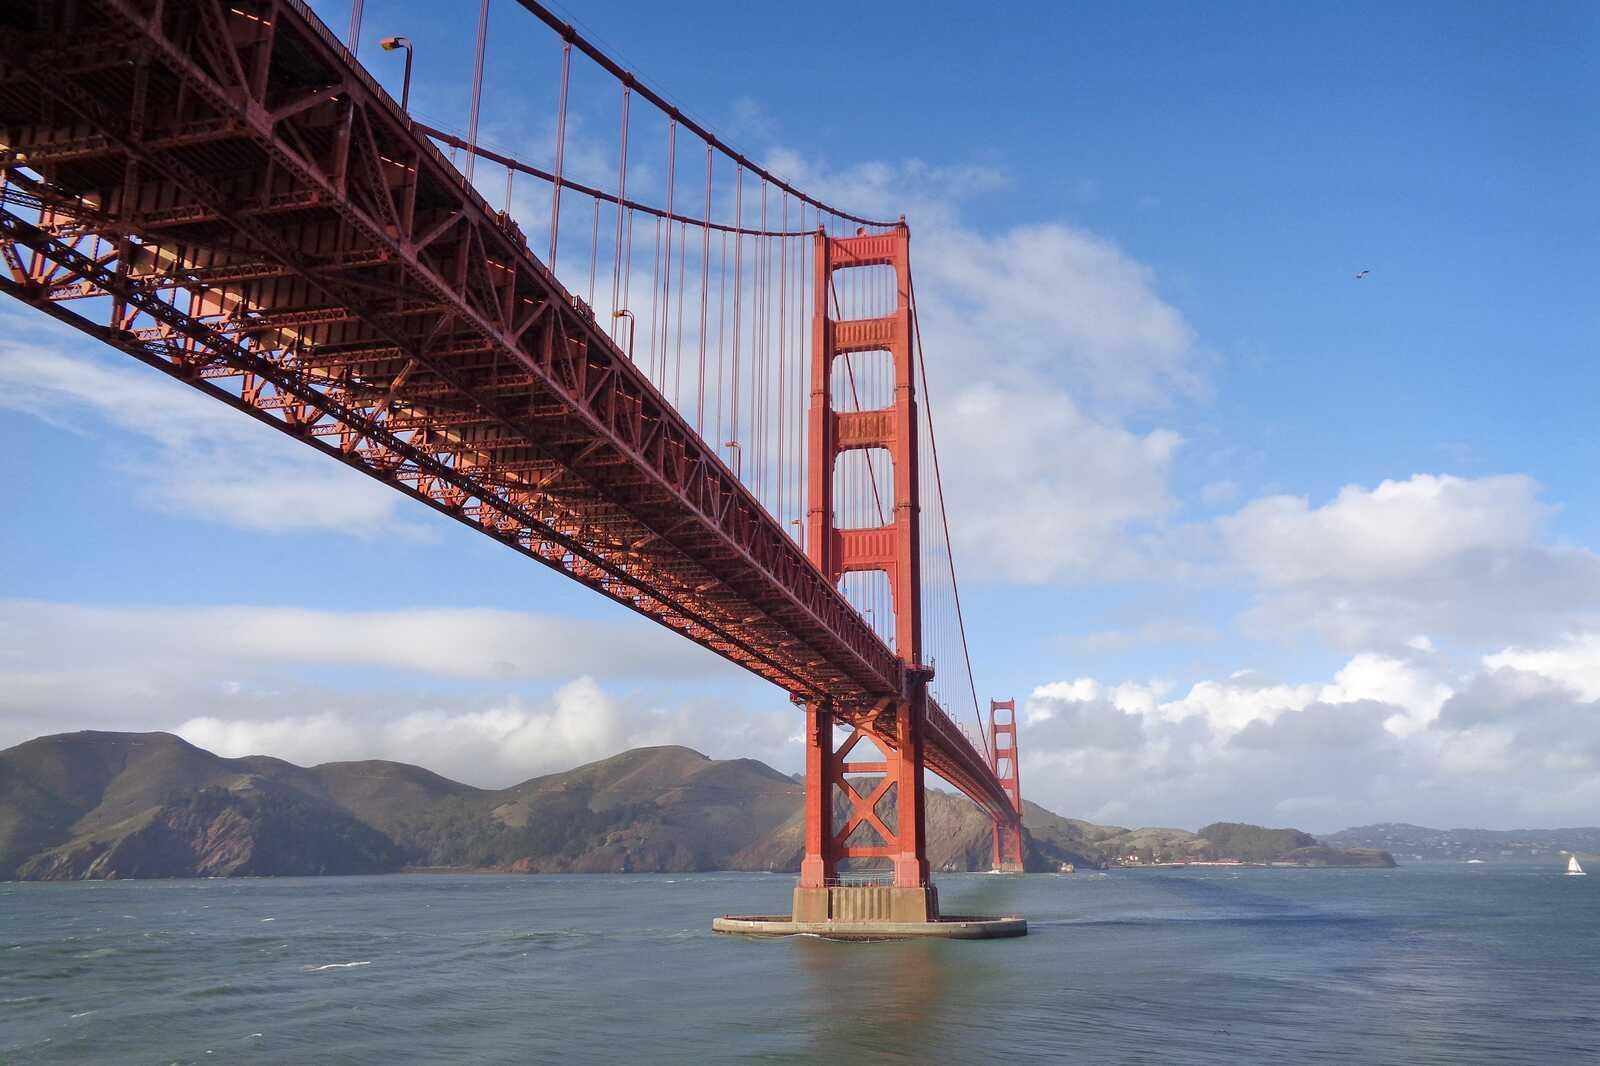 Preistipp USA Kste  Berge in Kalifornien  CANUSA